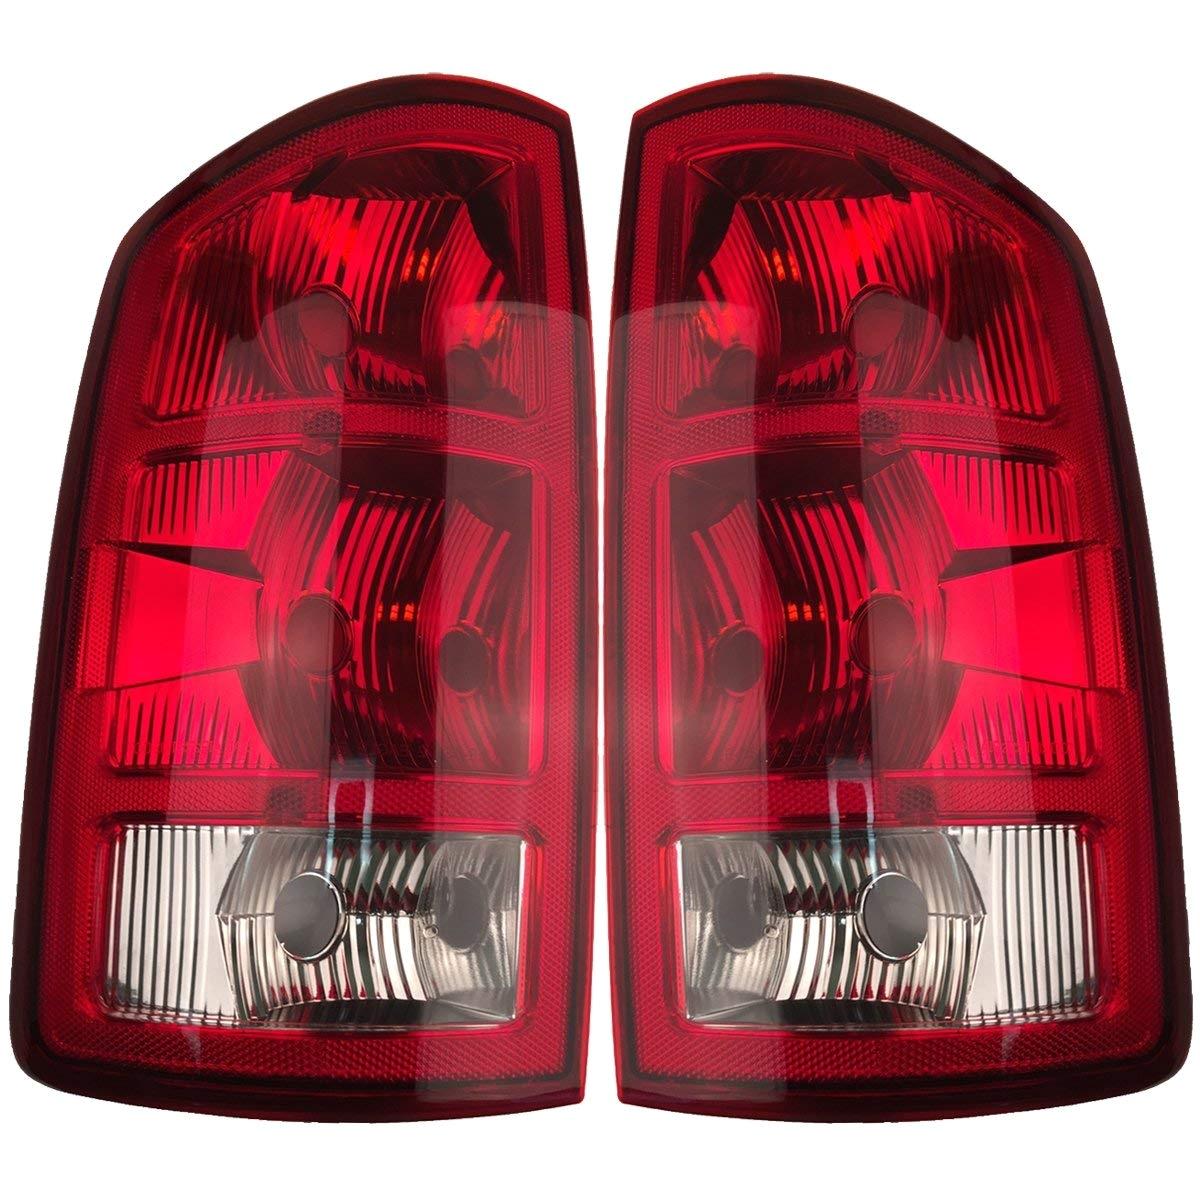 2002 Dodge Ram 1500 Tail Lights Amazon Com 2002 2006 Dodge Ram Pickup Tail Lights 1 Pairdriver and